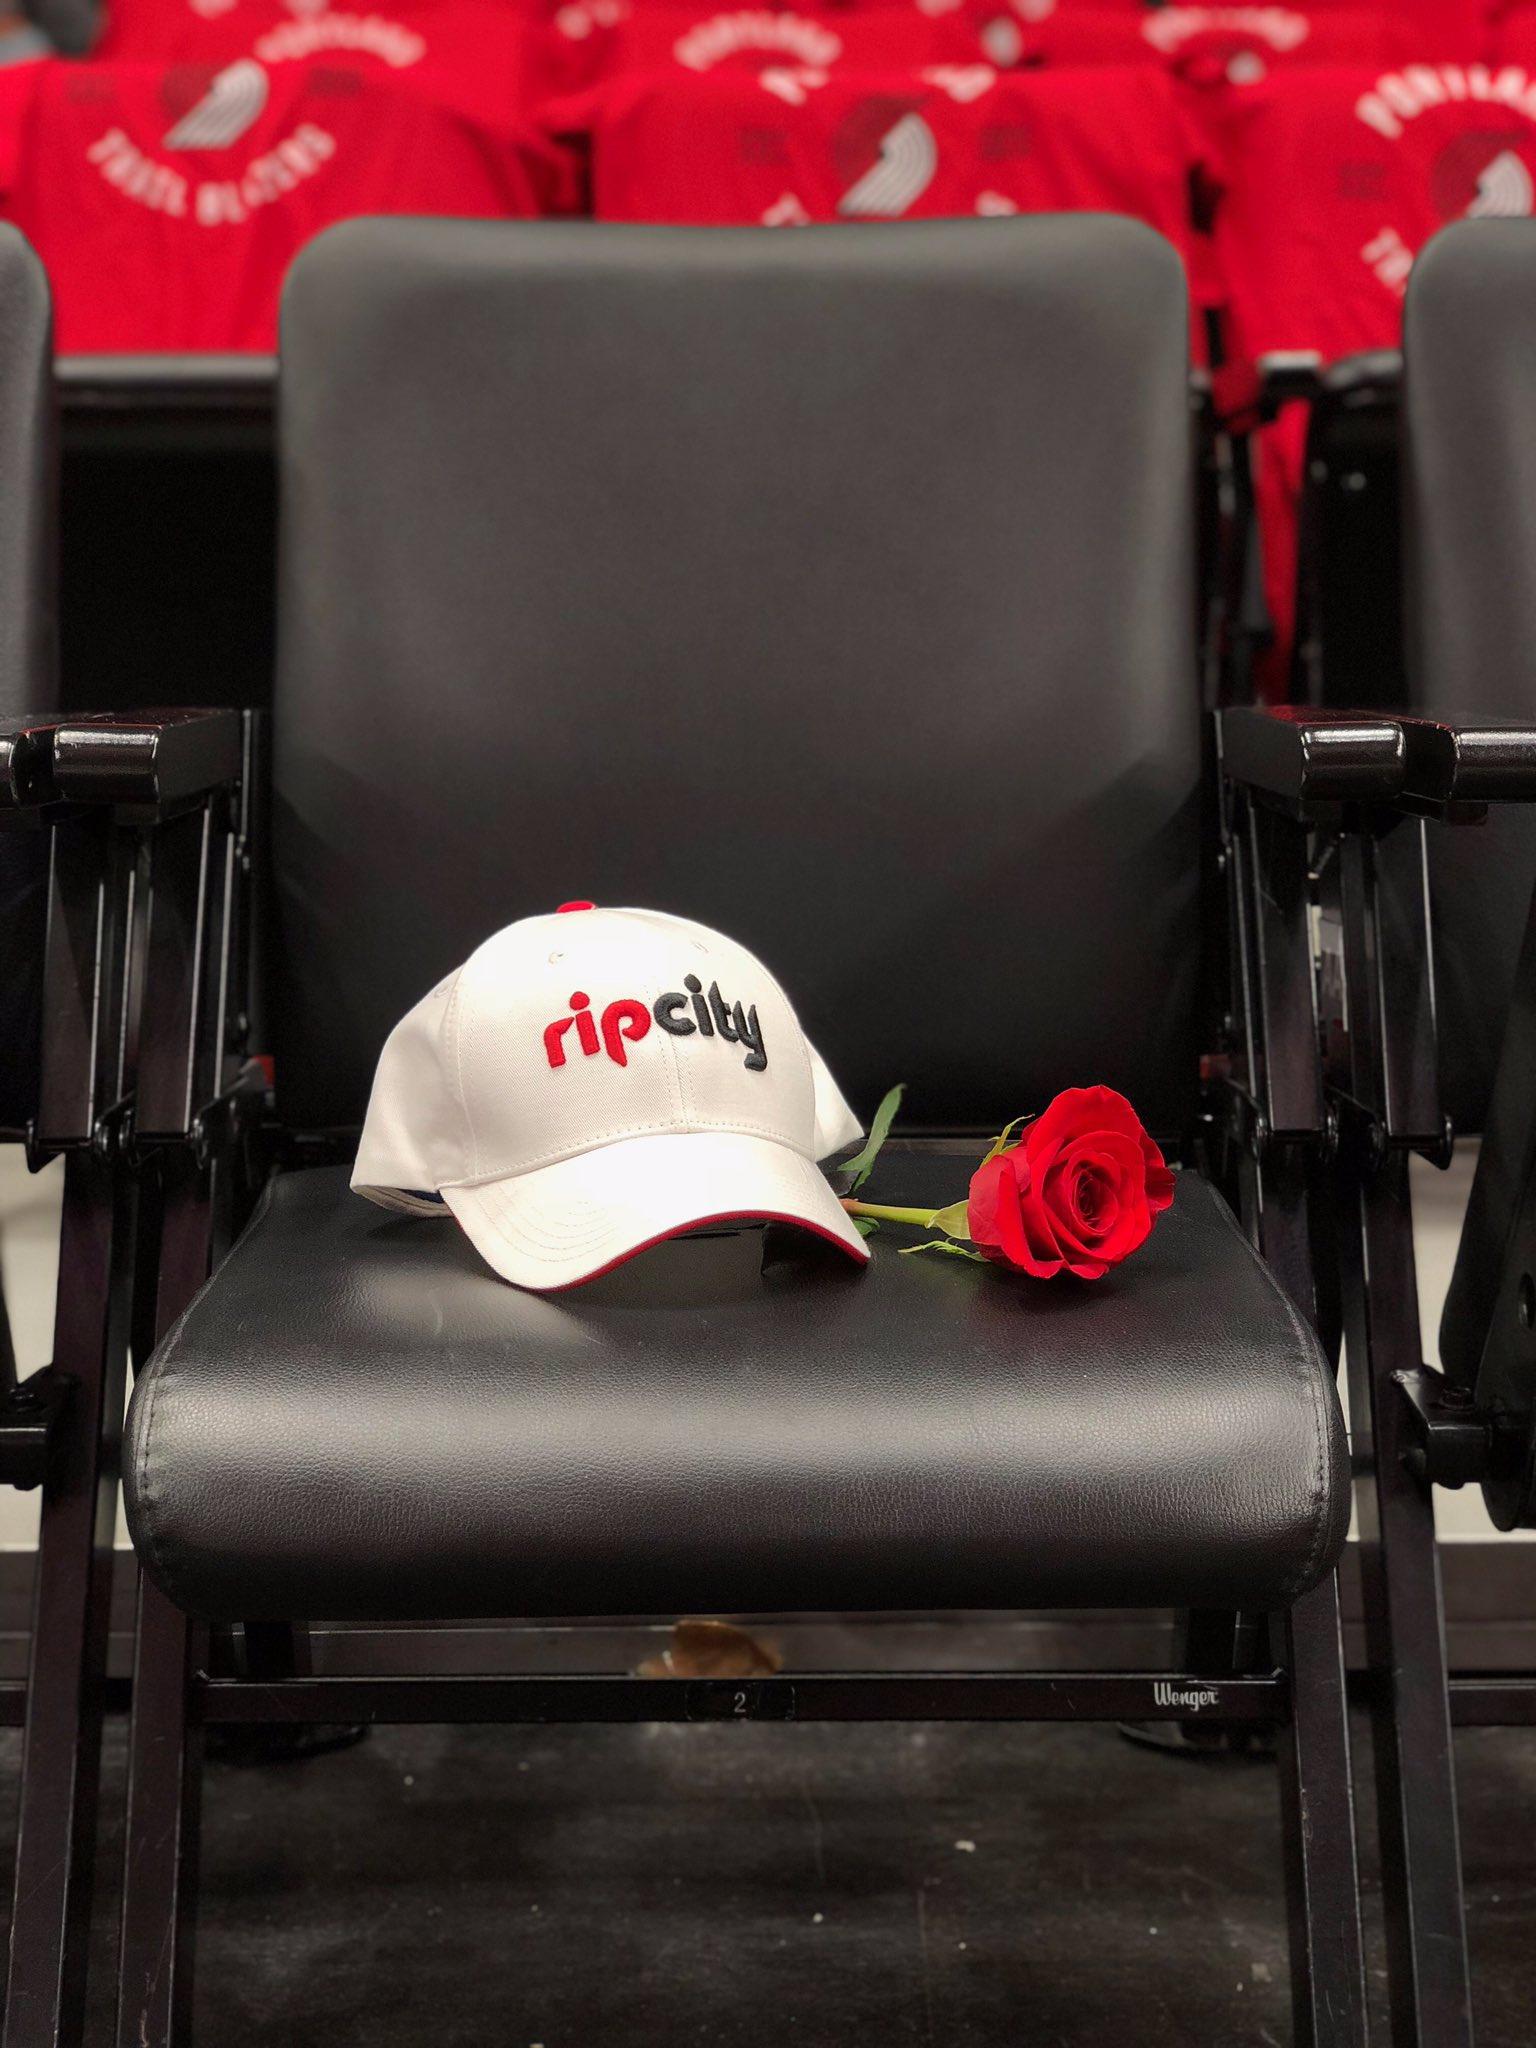 The @trailblazers will leave Paul Allen's seat open in Moda Center tonight. https://t.co/VarzKqvqMA